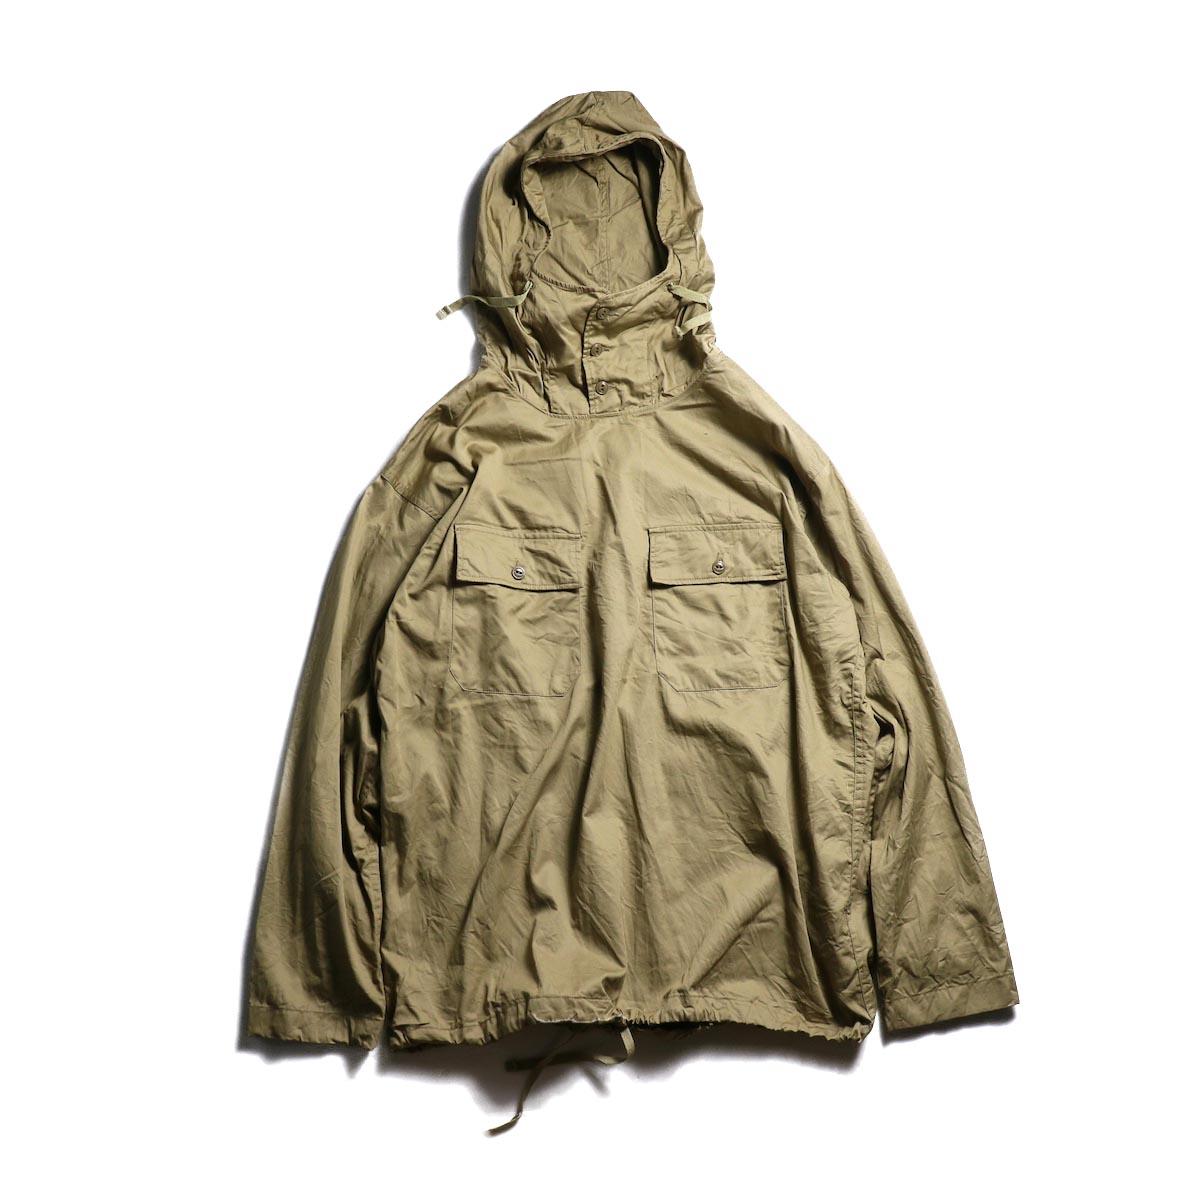 Engineered Garments / Cagoule Shirt -Fineline Twill (Khaki)